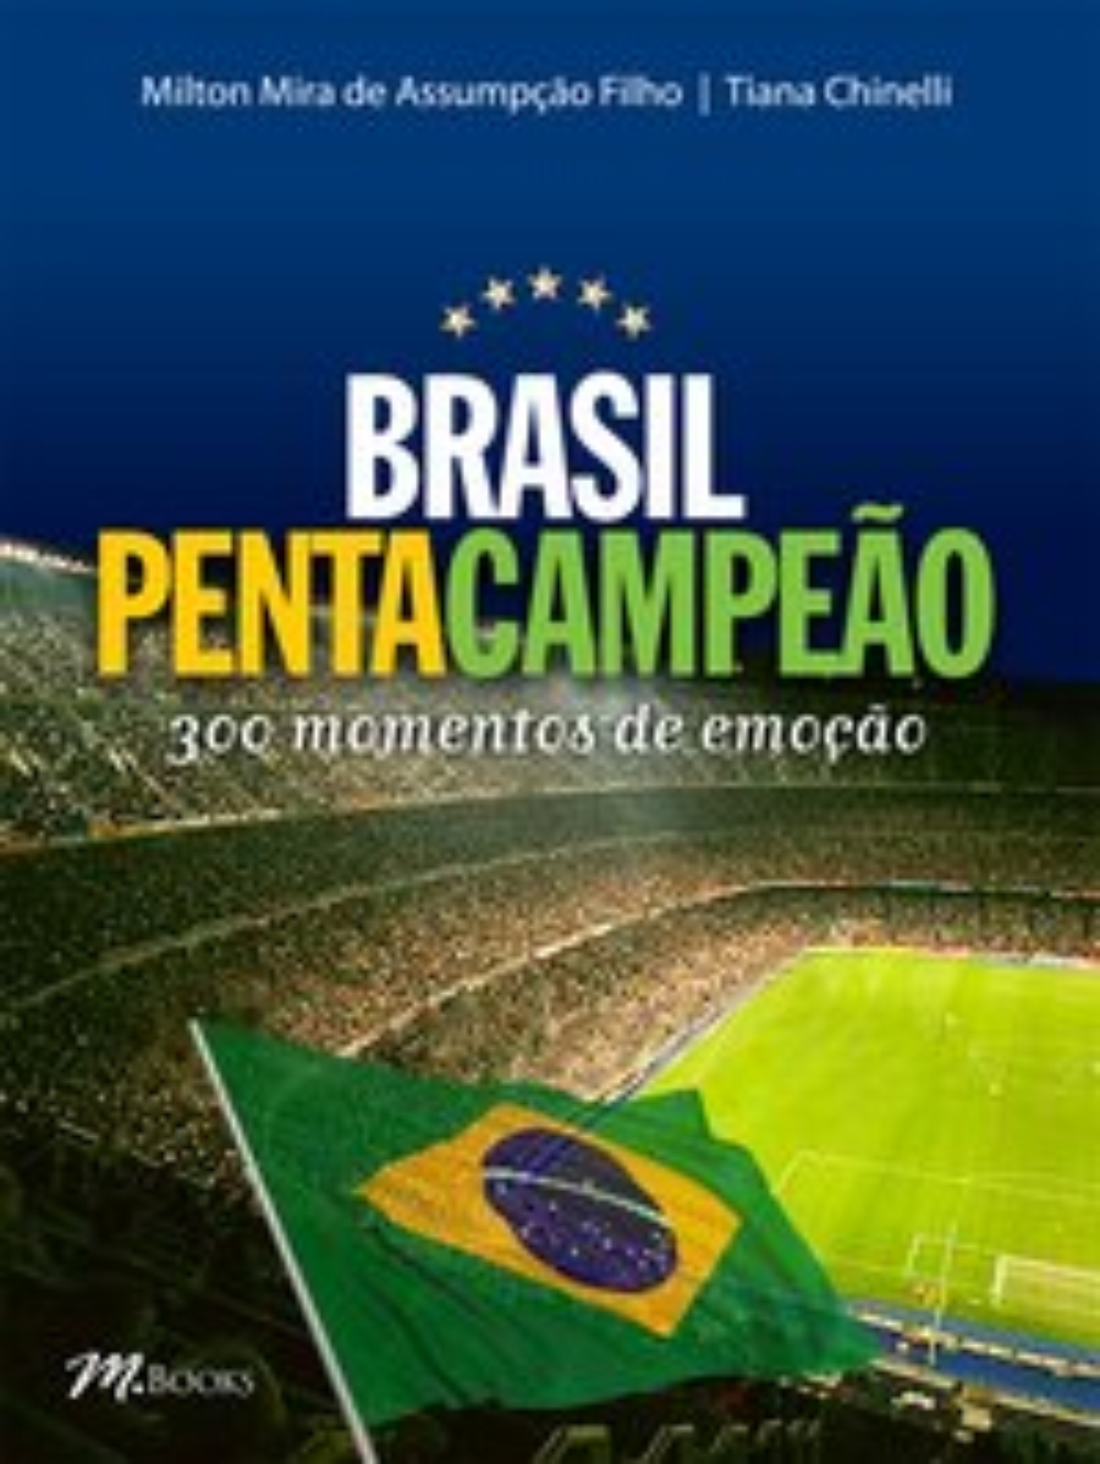 BRASIL PENTACAMPEAO - 300 MOMENTOS DE EMOCAO